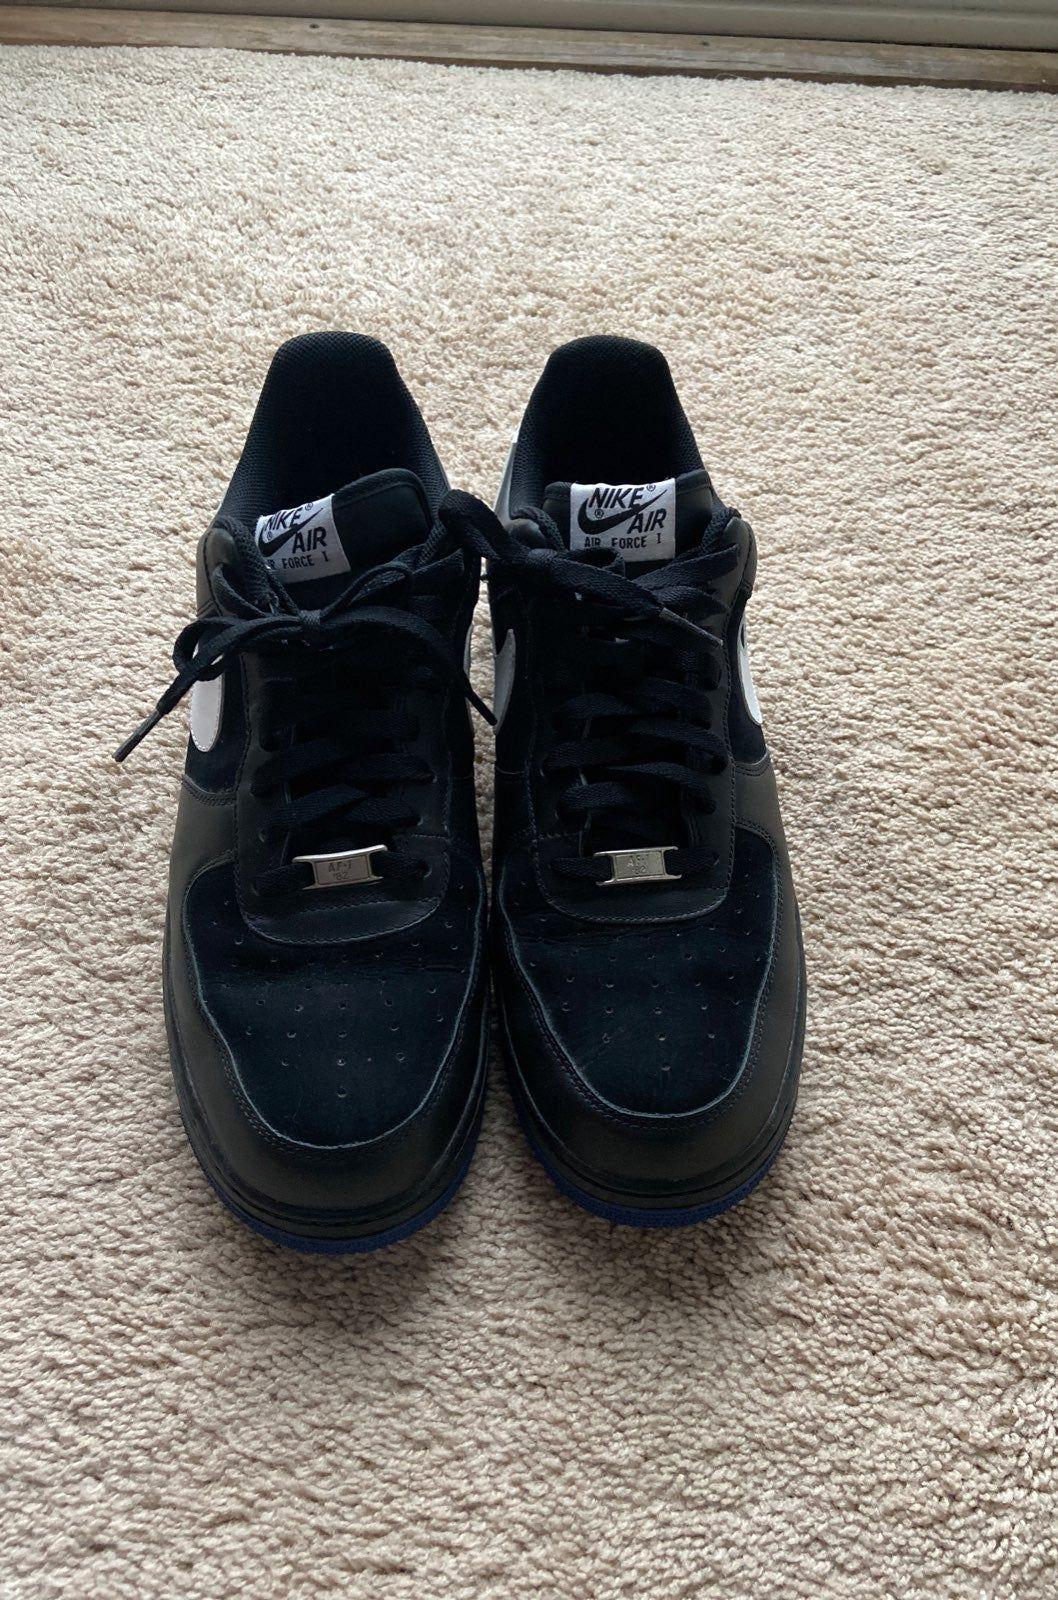 Nike Air Force 1 '82 Black/White/Purple